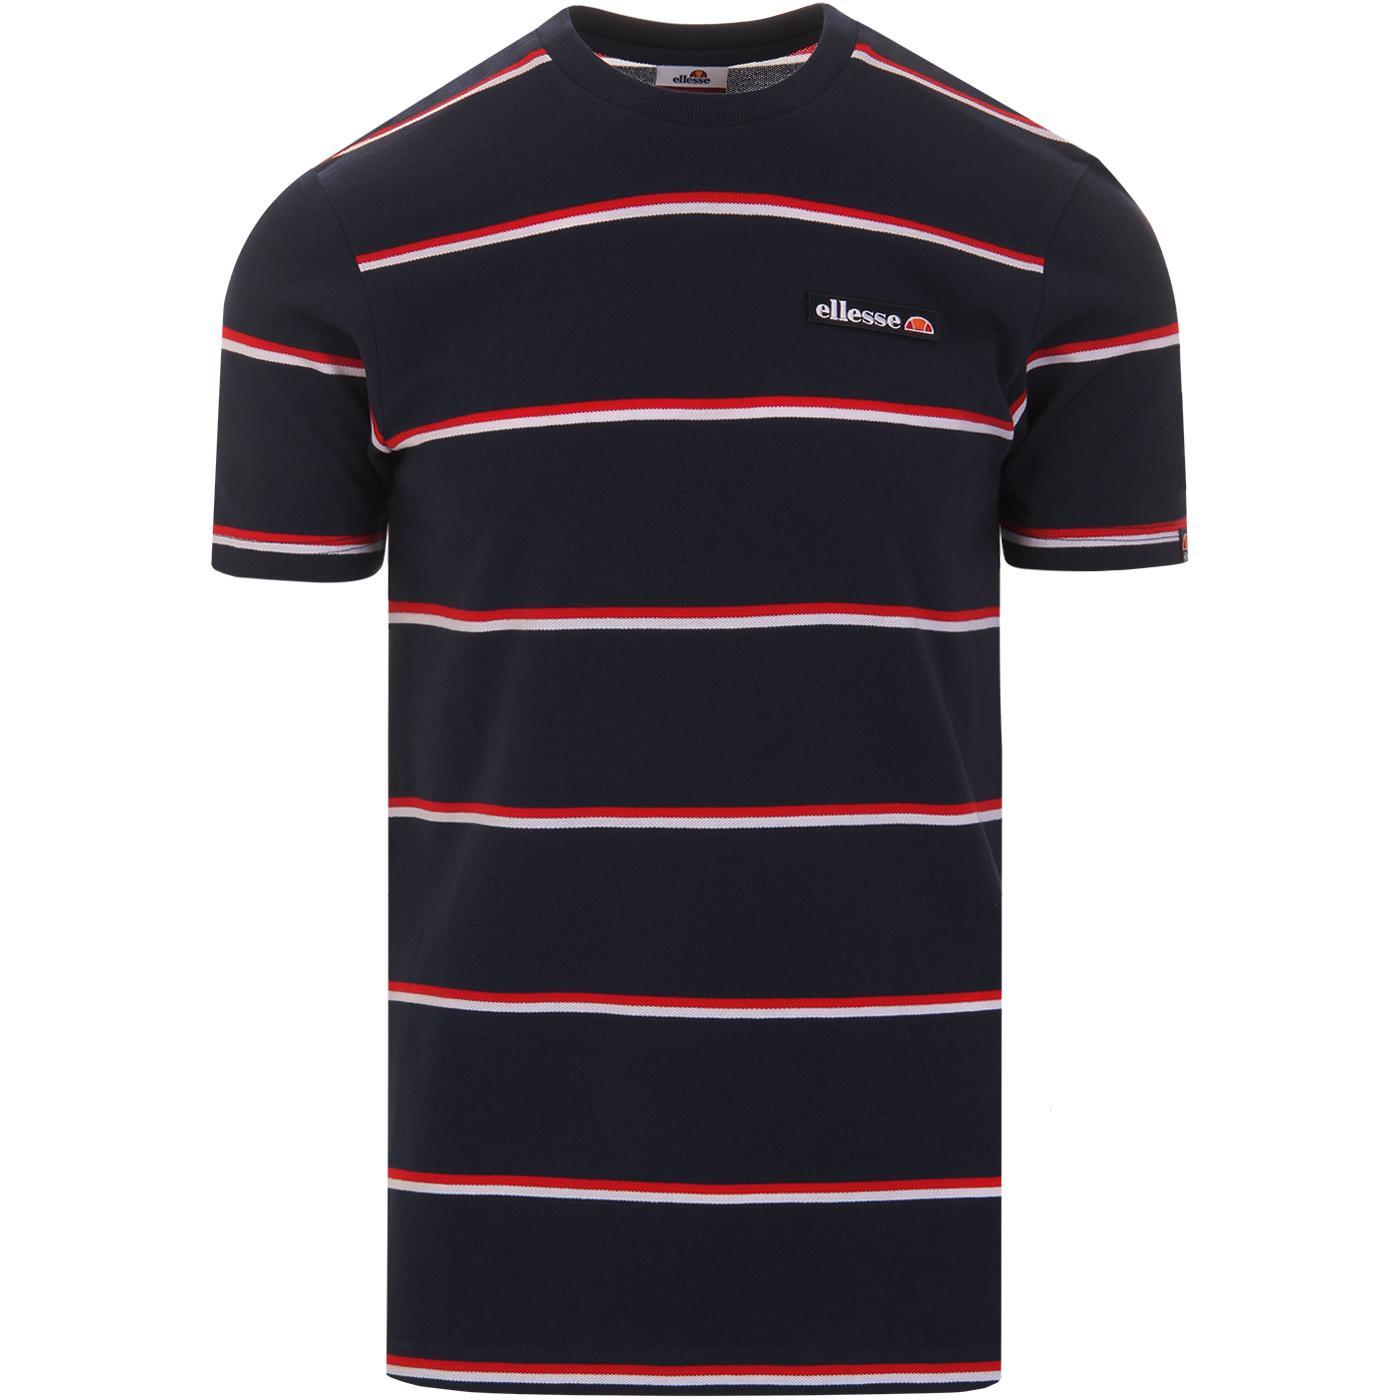 Mezzo ELLESSE Retro Mod Stripe Pique T-Shirt NAVY